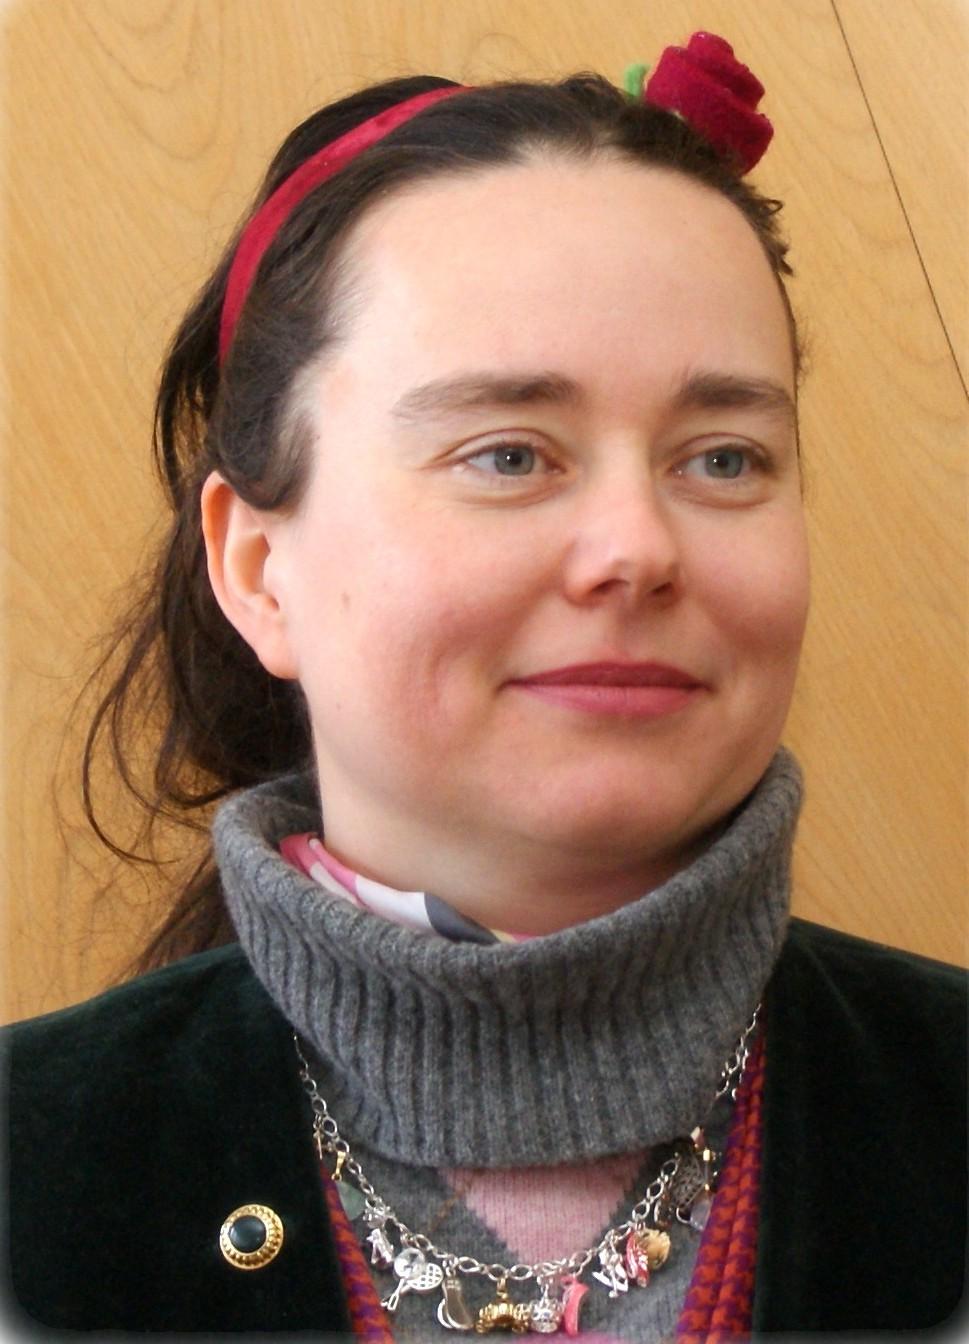 doc. Ing. Mgr. Adriana Horníková, PhD. (Dr.)